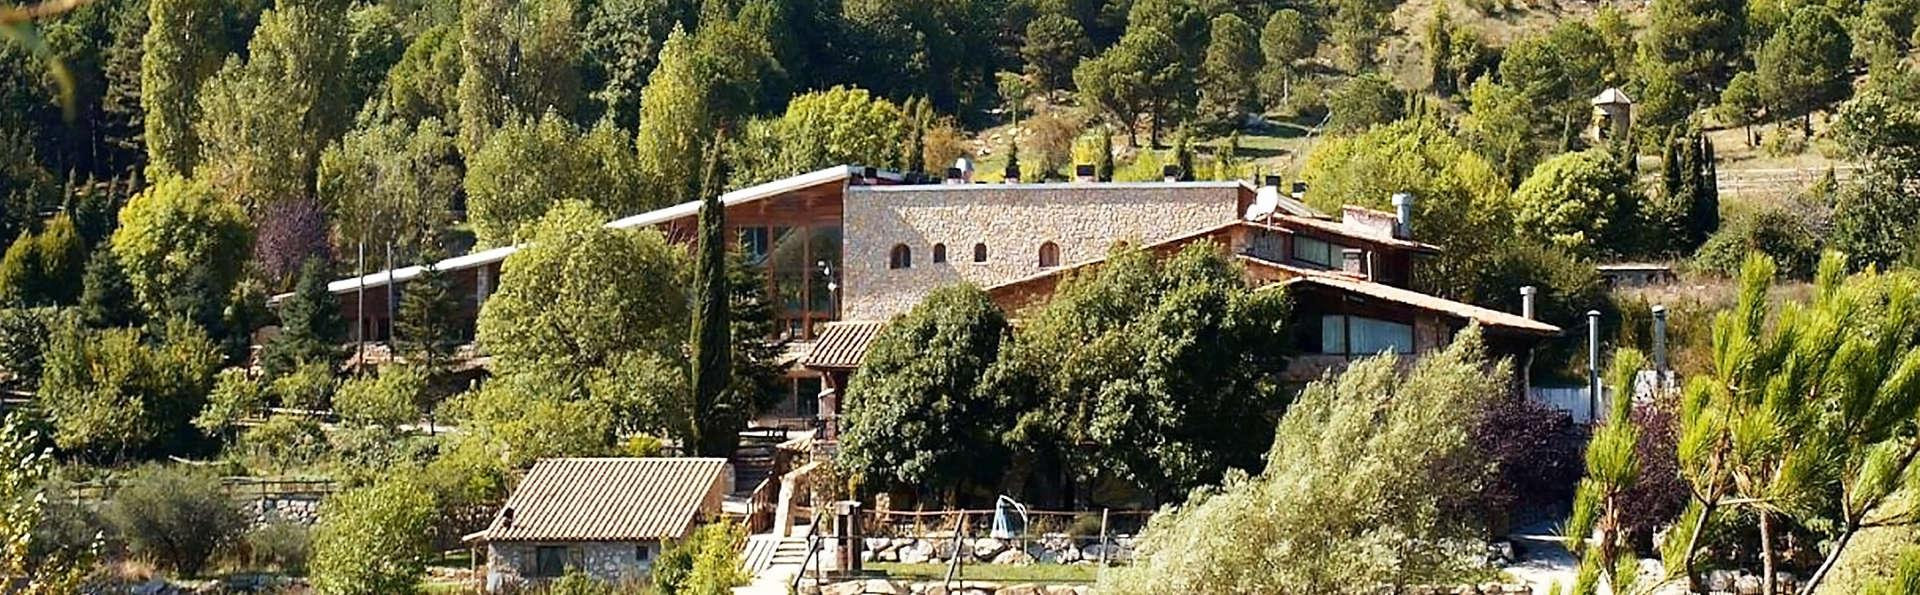 Hotel El Jou - EDIT_front1.jpg